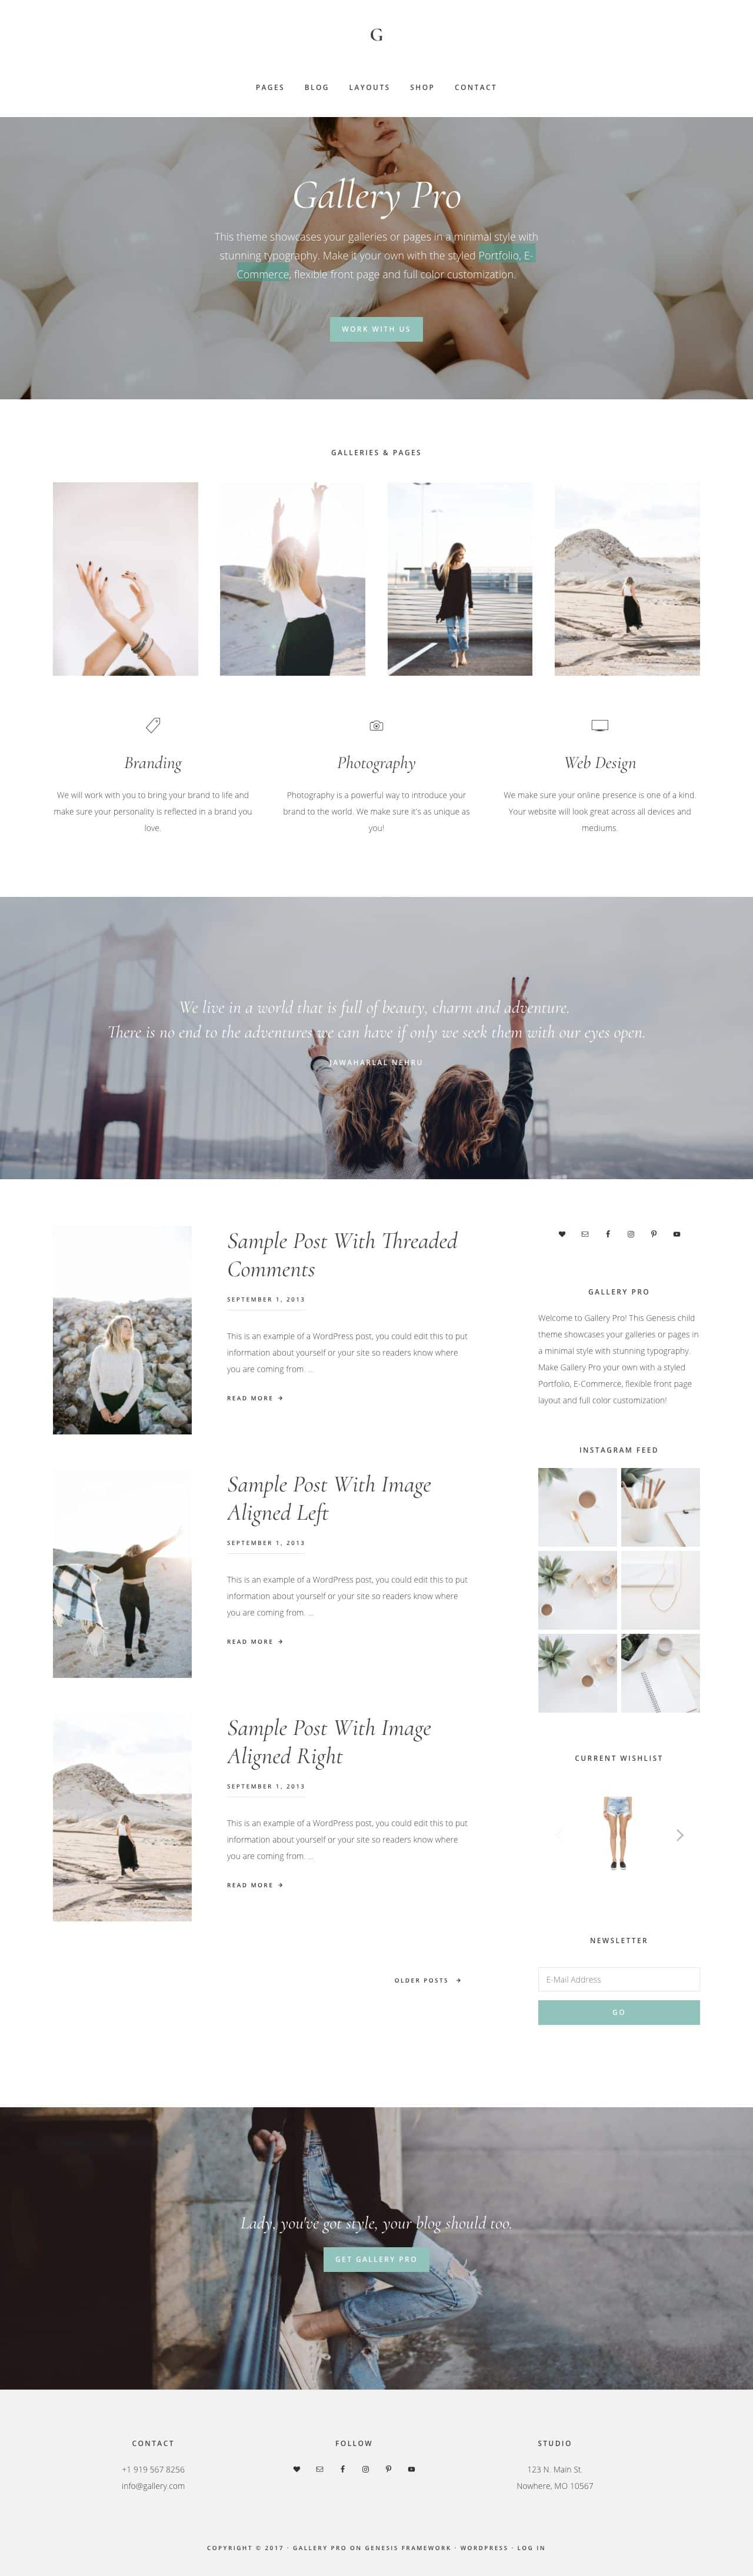 Gallery Pro WordPress Genesis Framework Theme